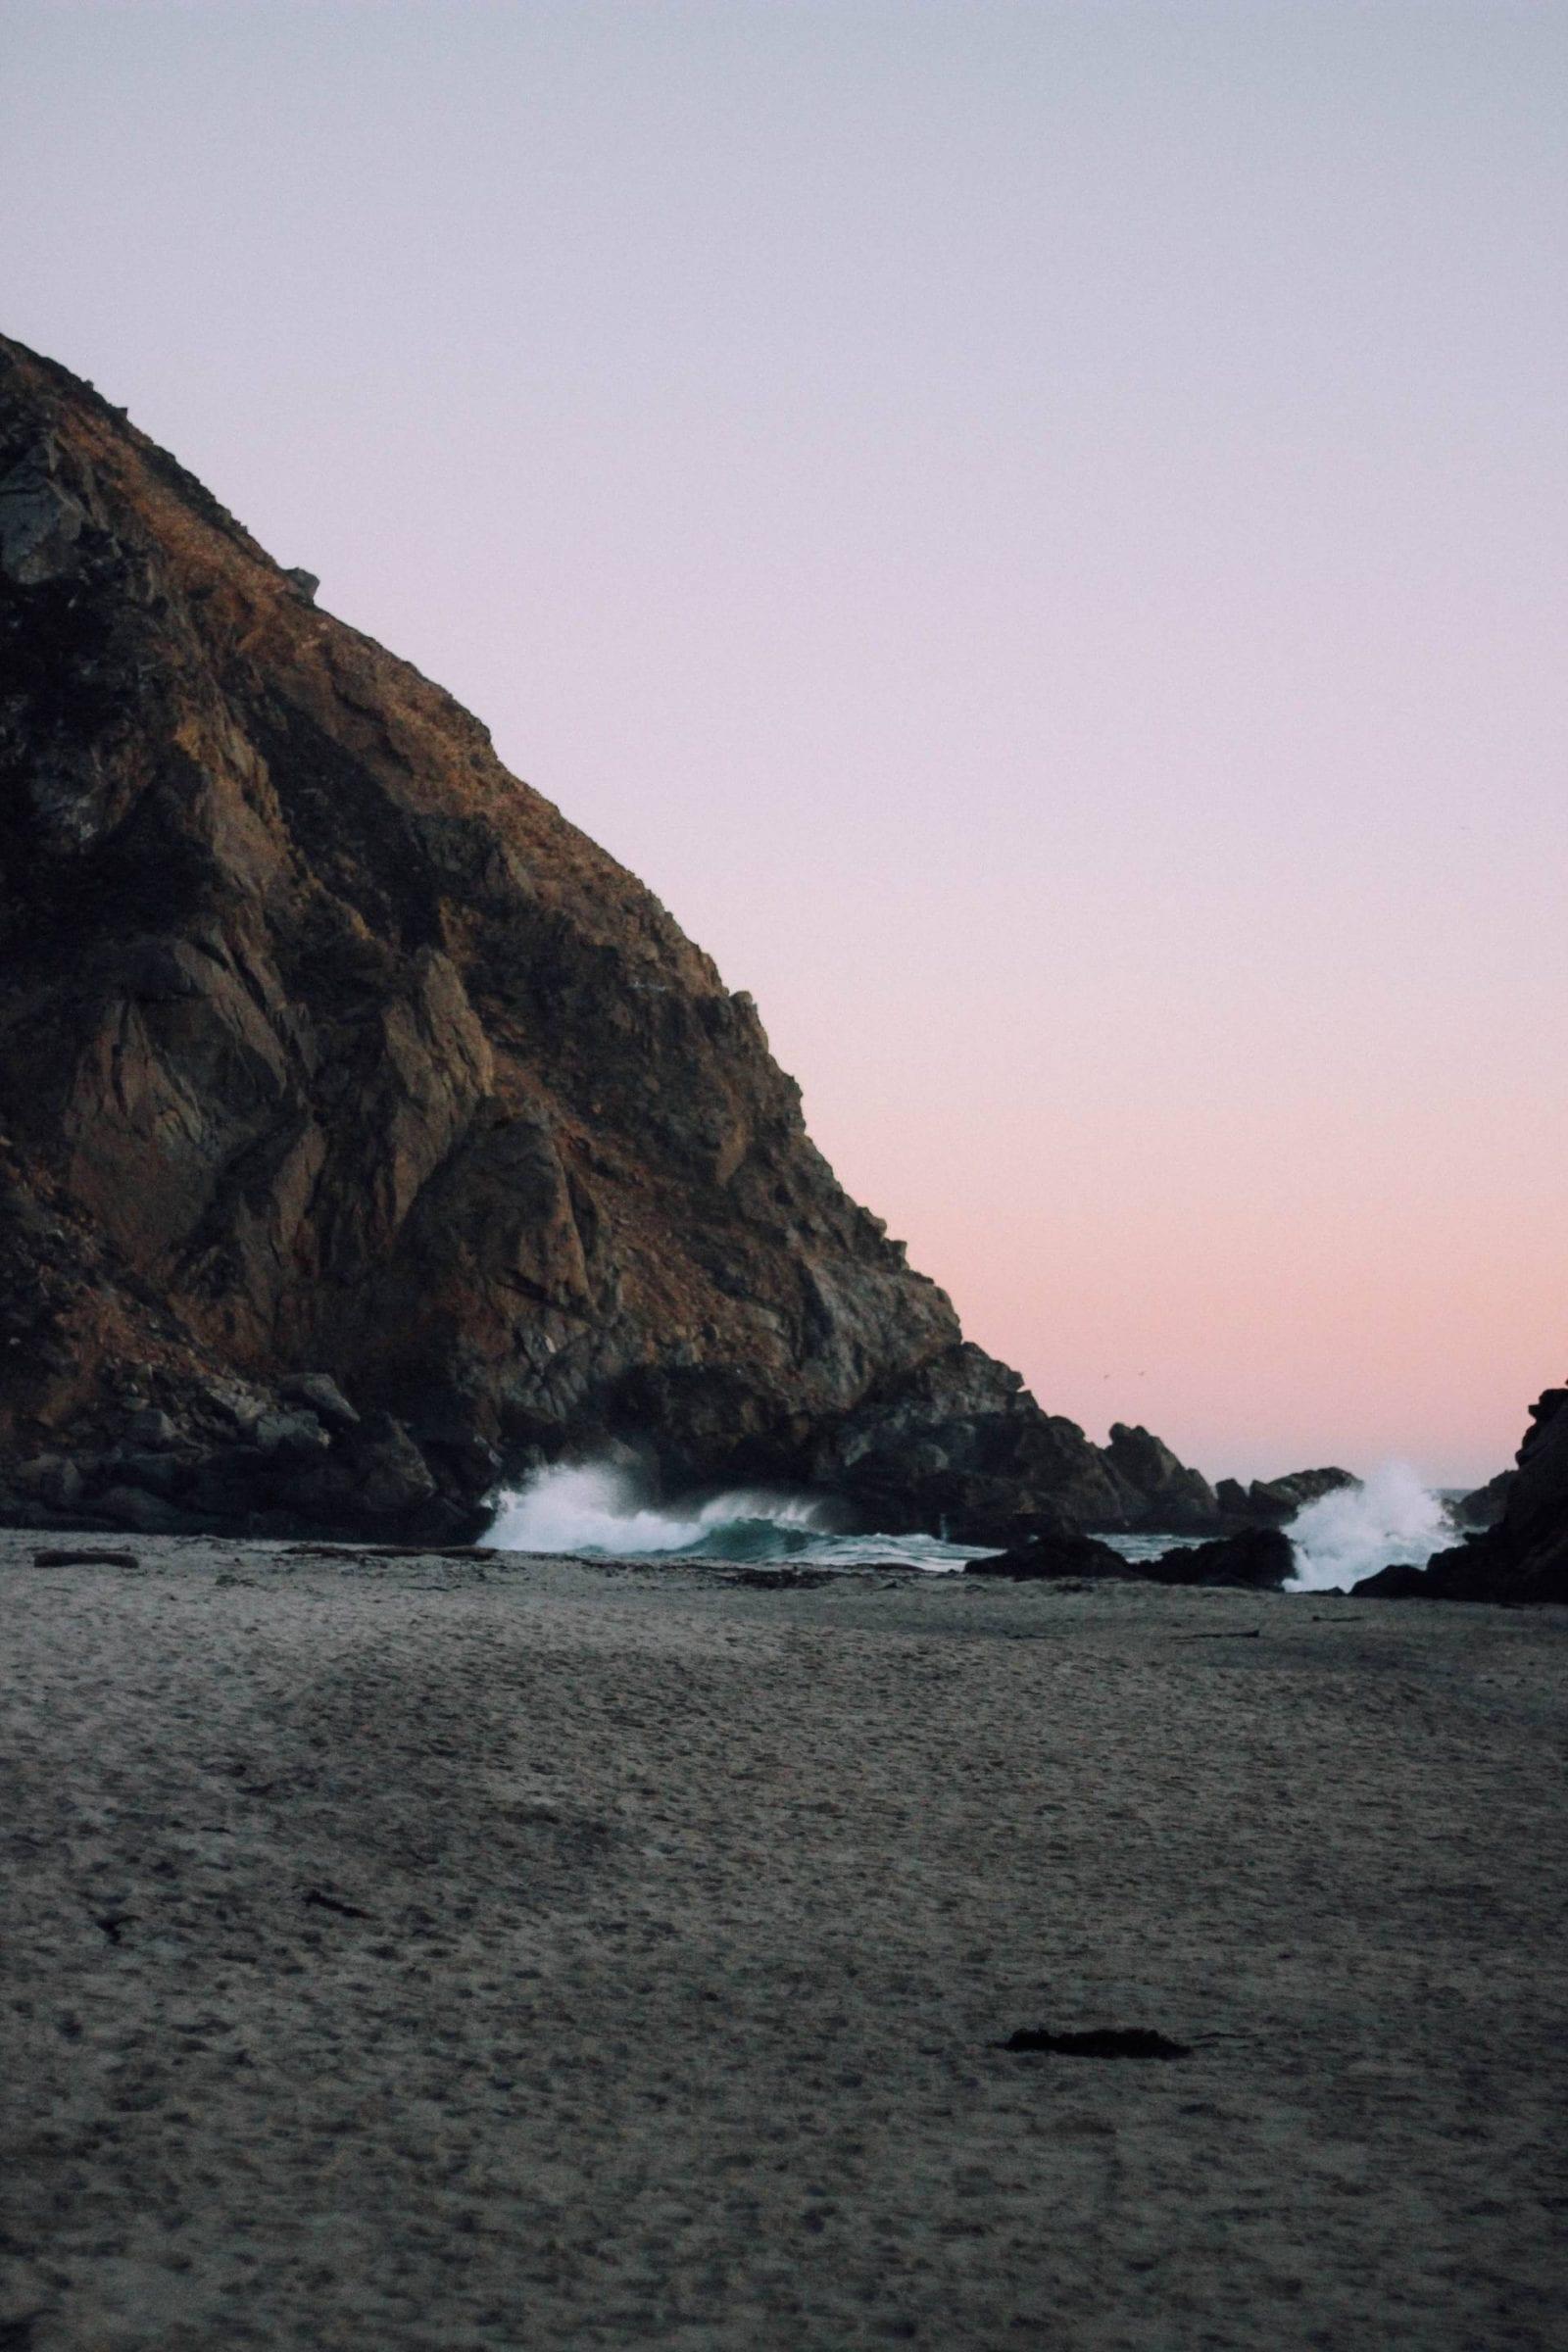 Pfeiffer Beach in Big Sur